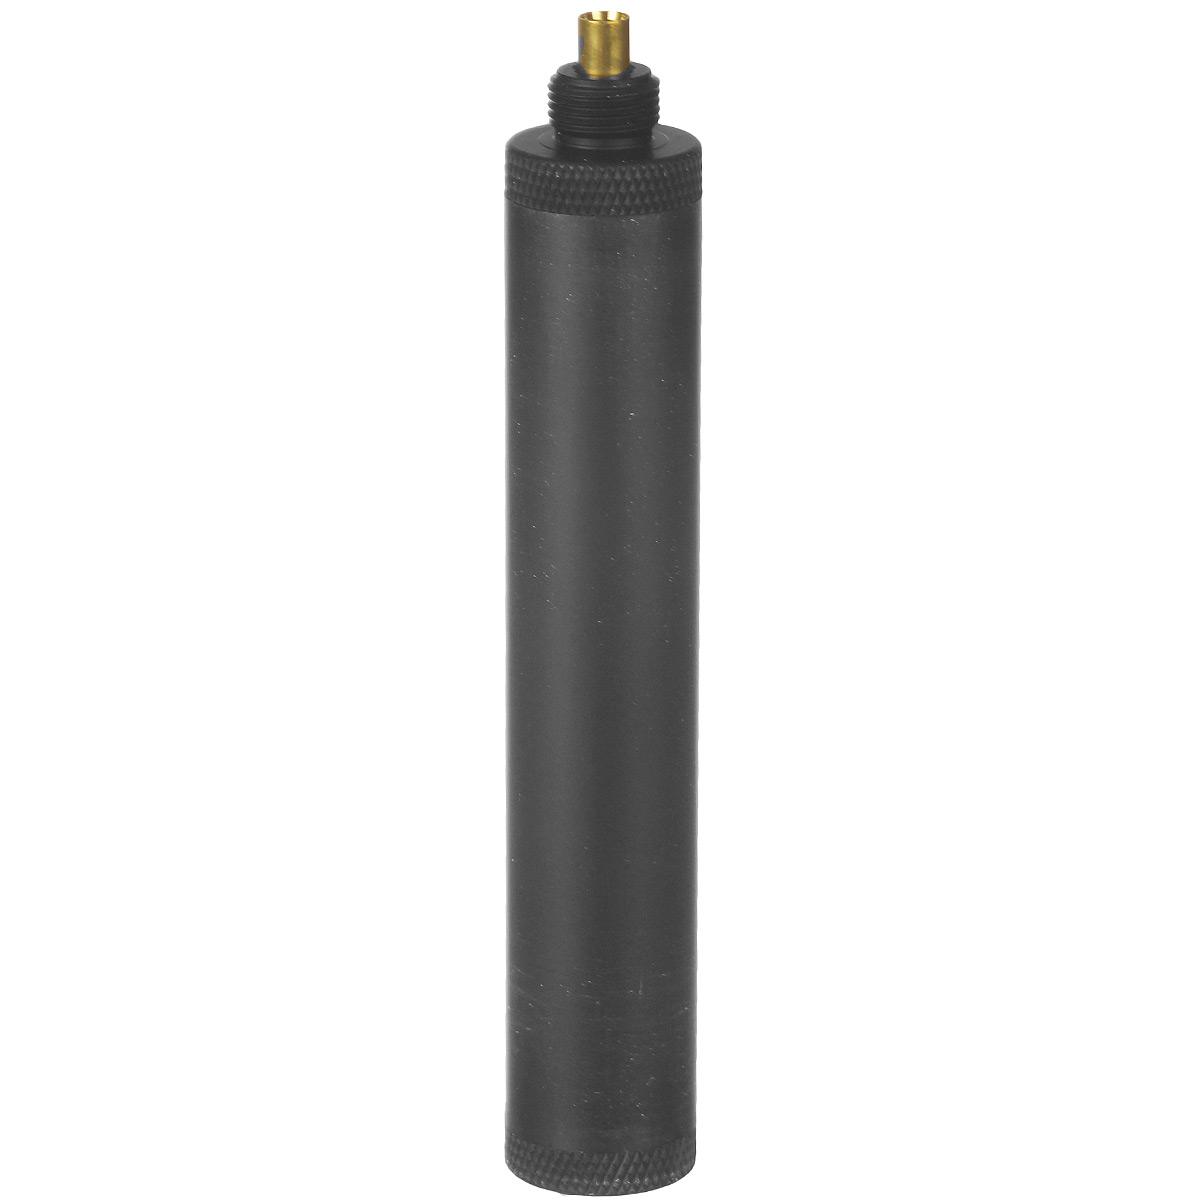 ASGимитация глушителя-удлинитель ствола CZ75D, CZ 75 P-07, STI (17644)